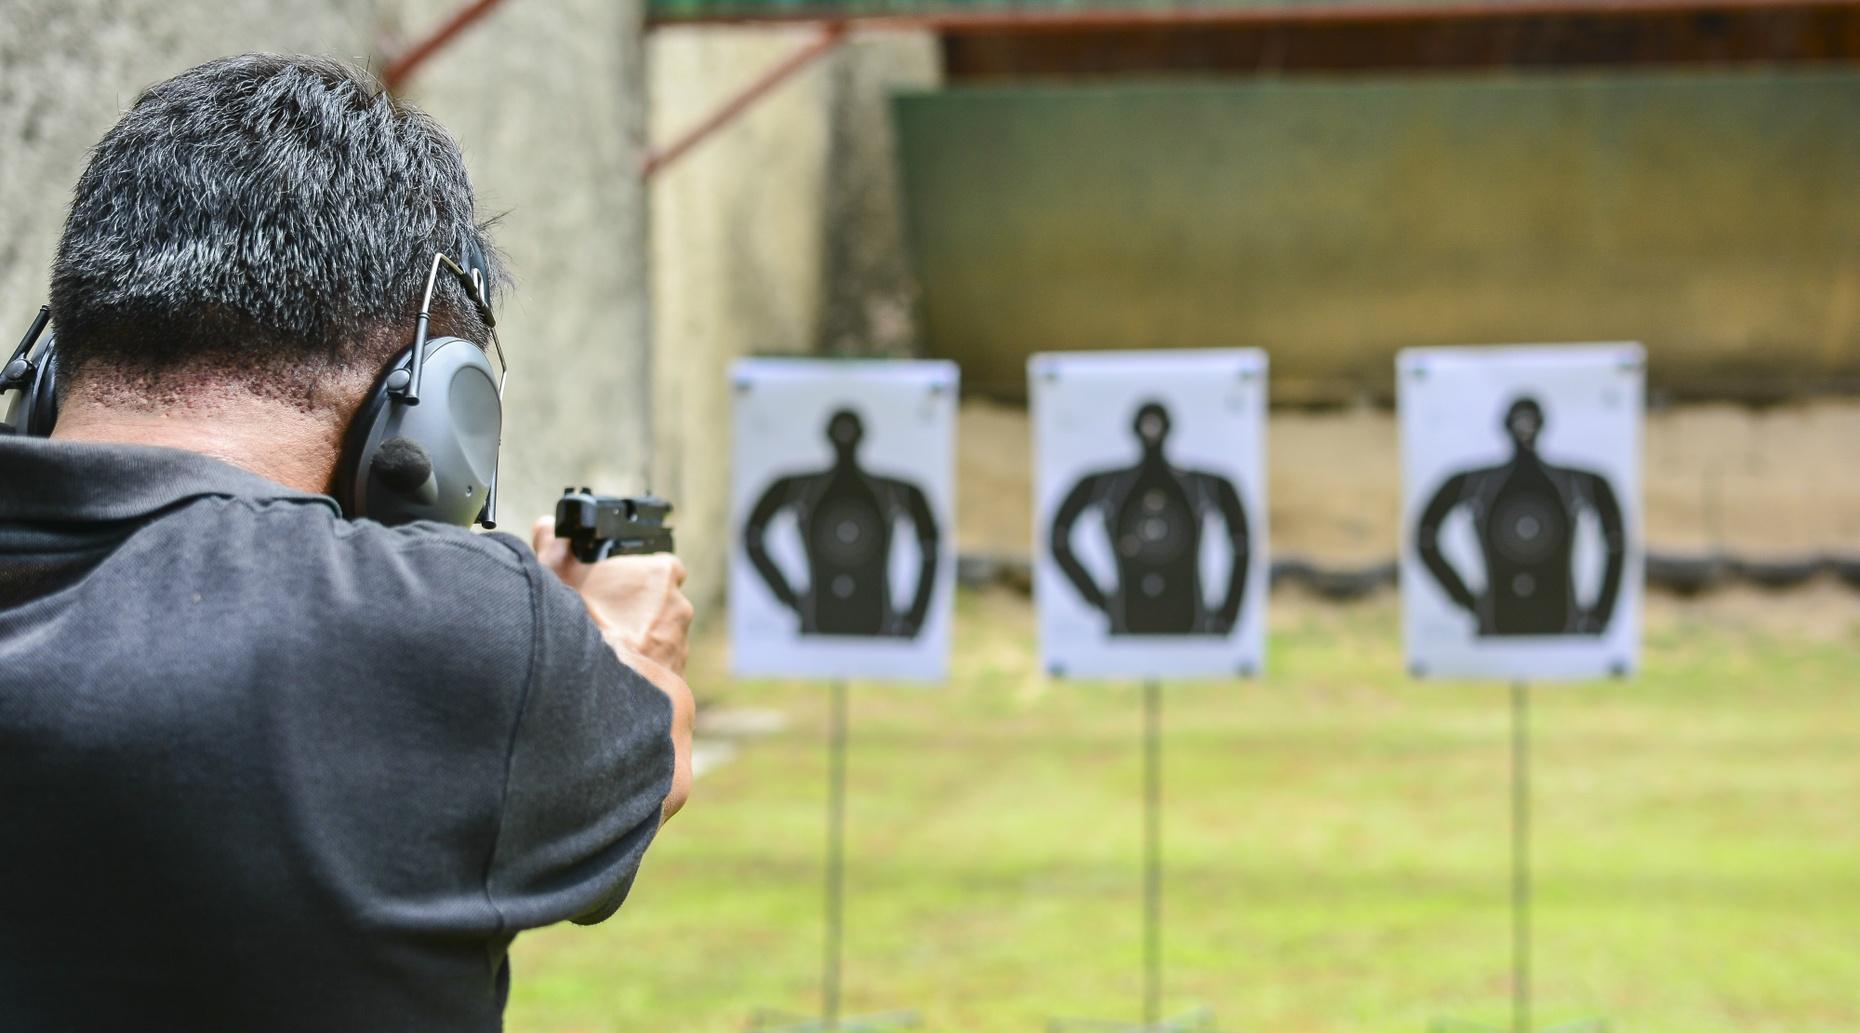 Introduction to Handguns Safety Class in Cedar Park, Texas